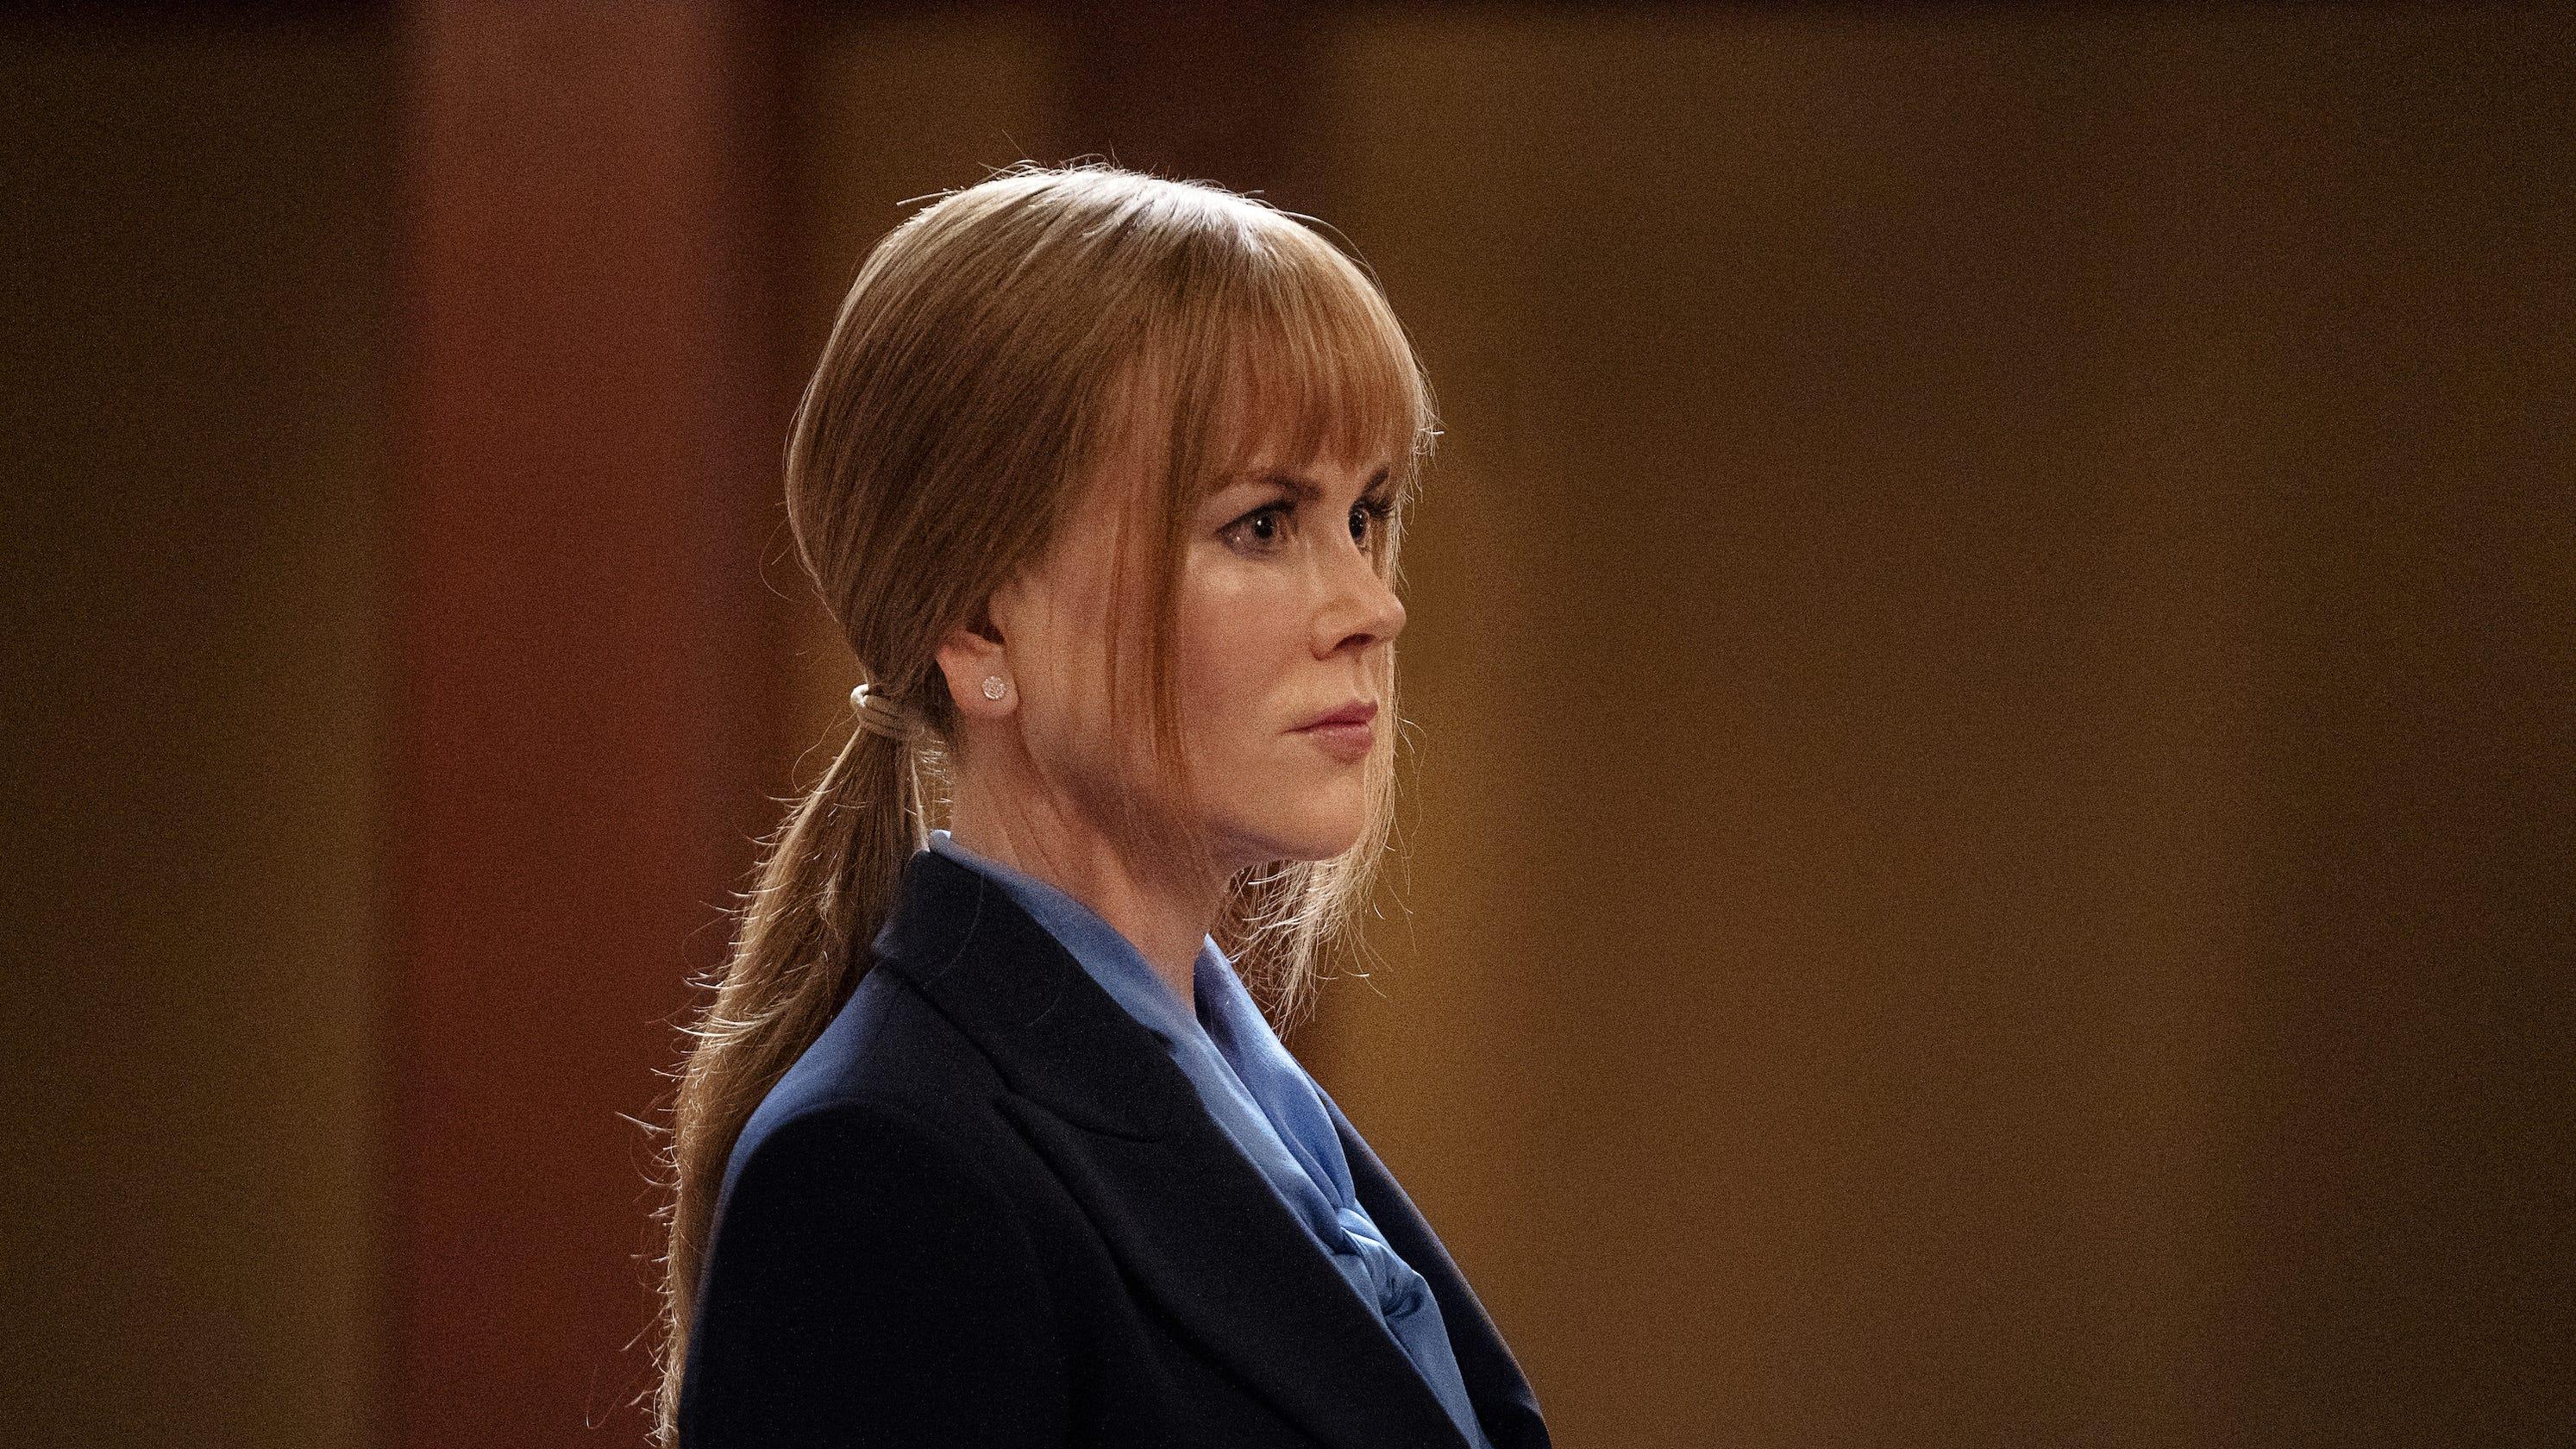 Big Little Lies' finale recap: Season 2, Episode 7, 'I Want